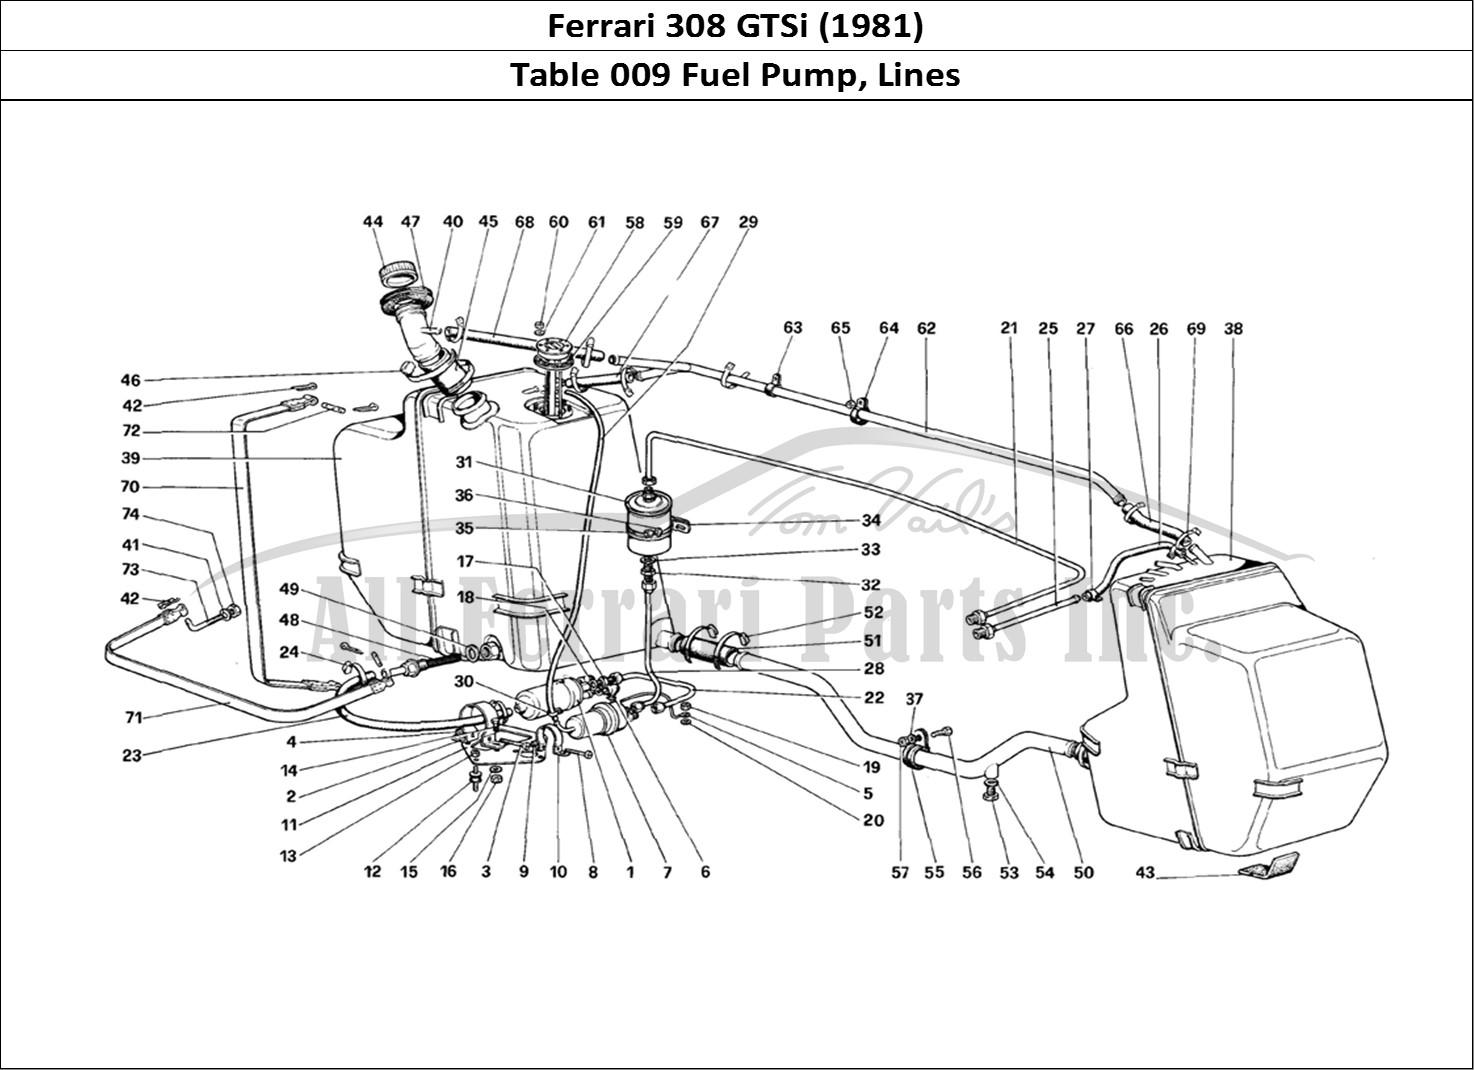 Buy Original Ferrari 308 Gtsi 009 Fuel Pump Lines